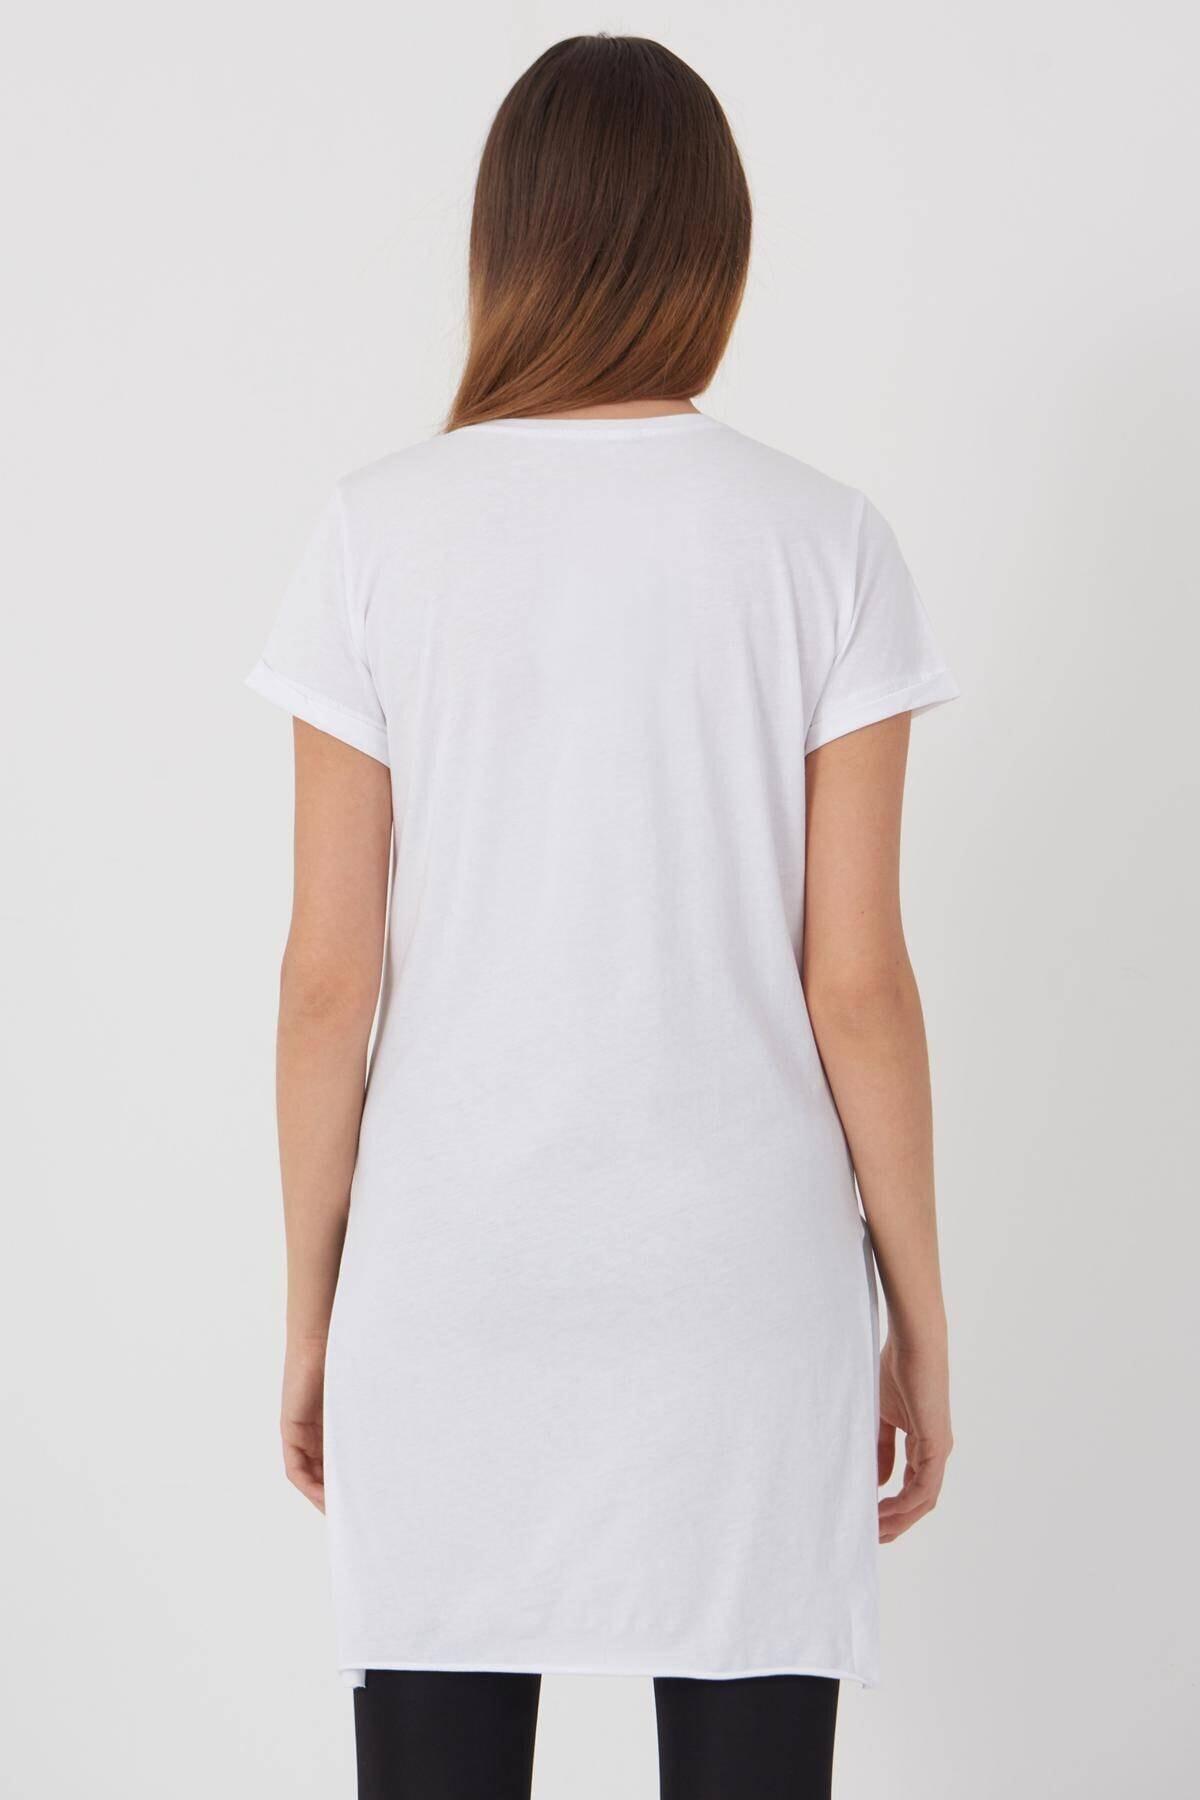 Addax Kadın Beyaz V Yaka T-Shirt P0102 - U1 Adx-00007205 3